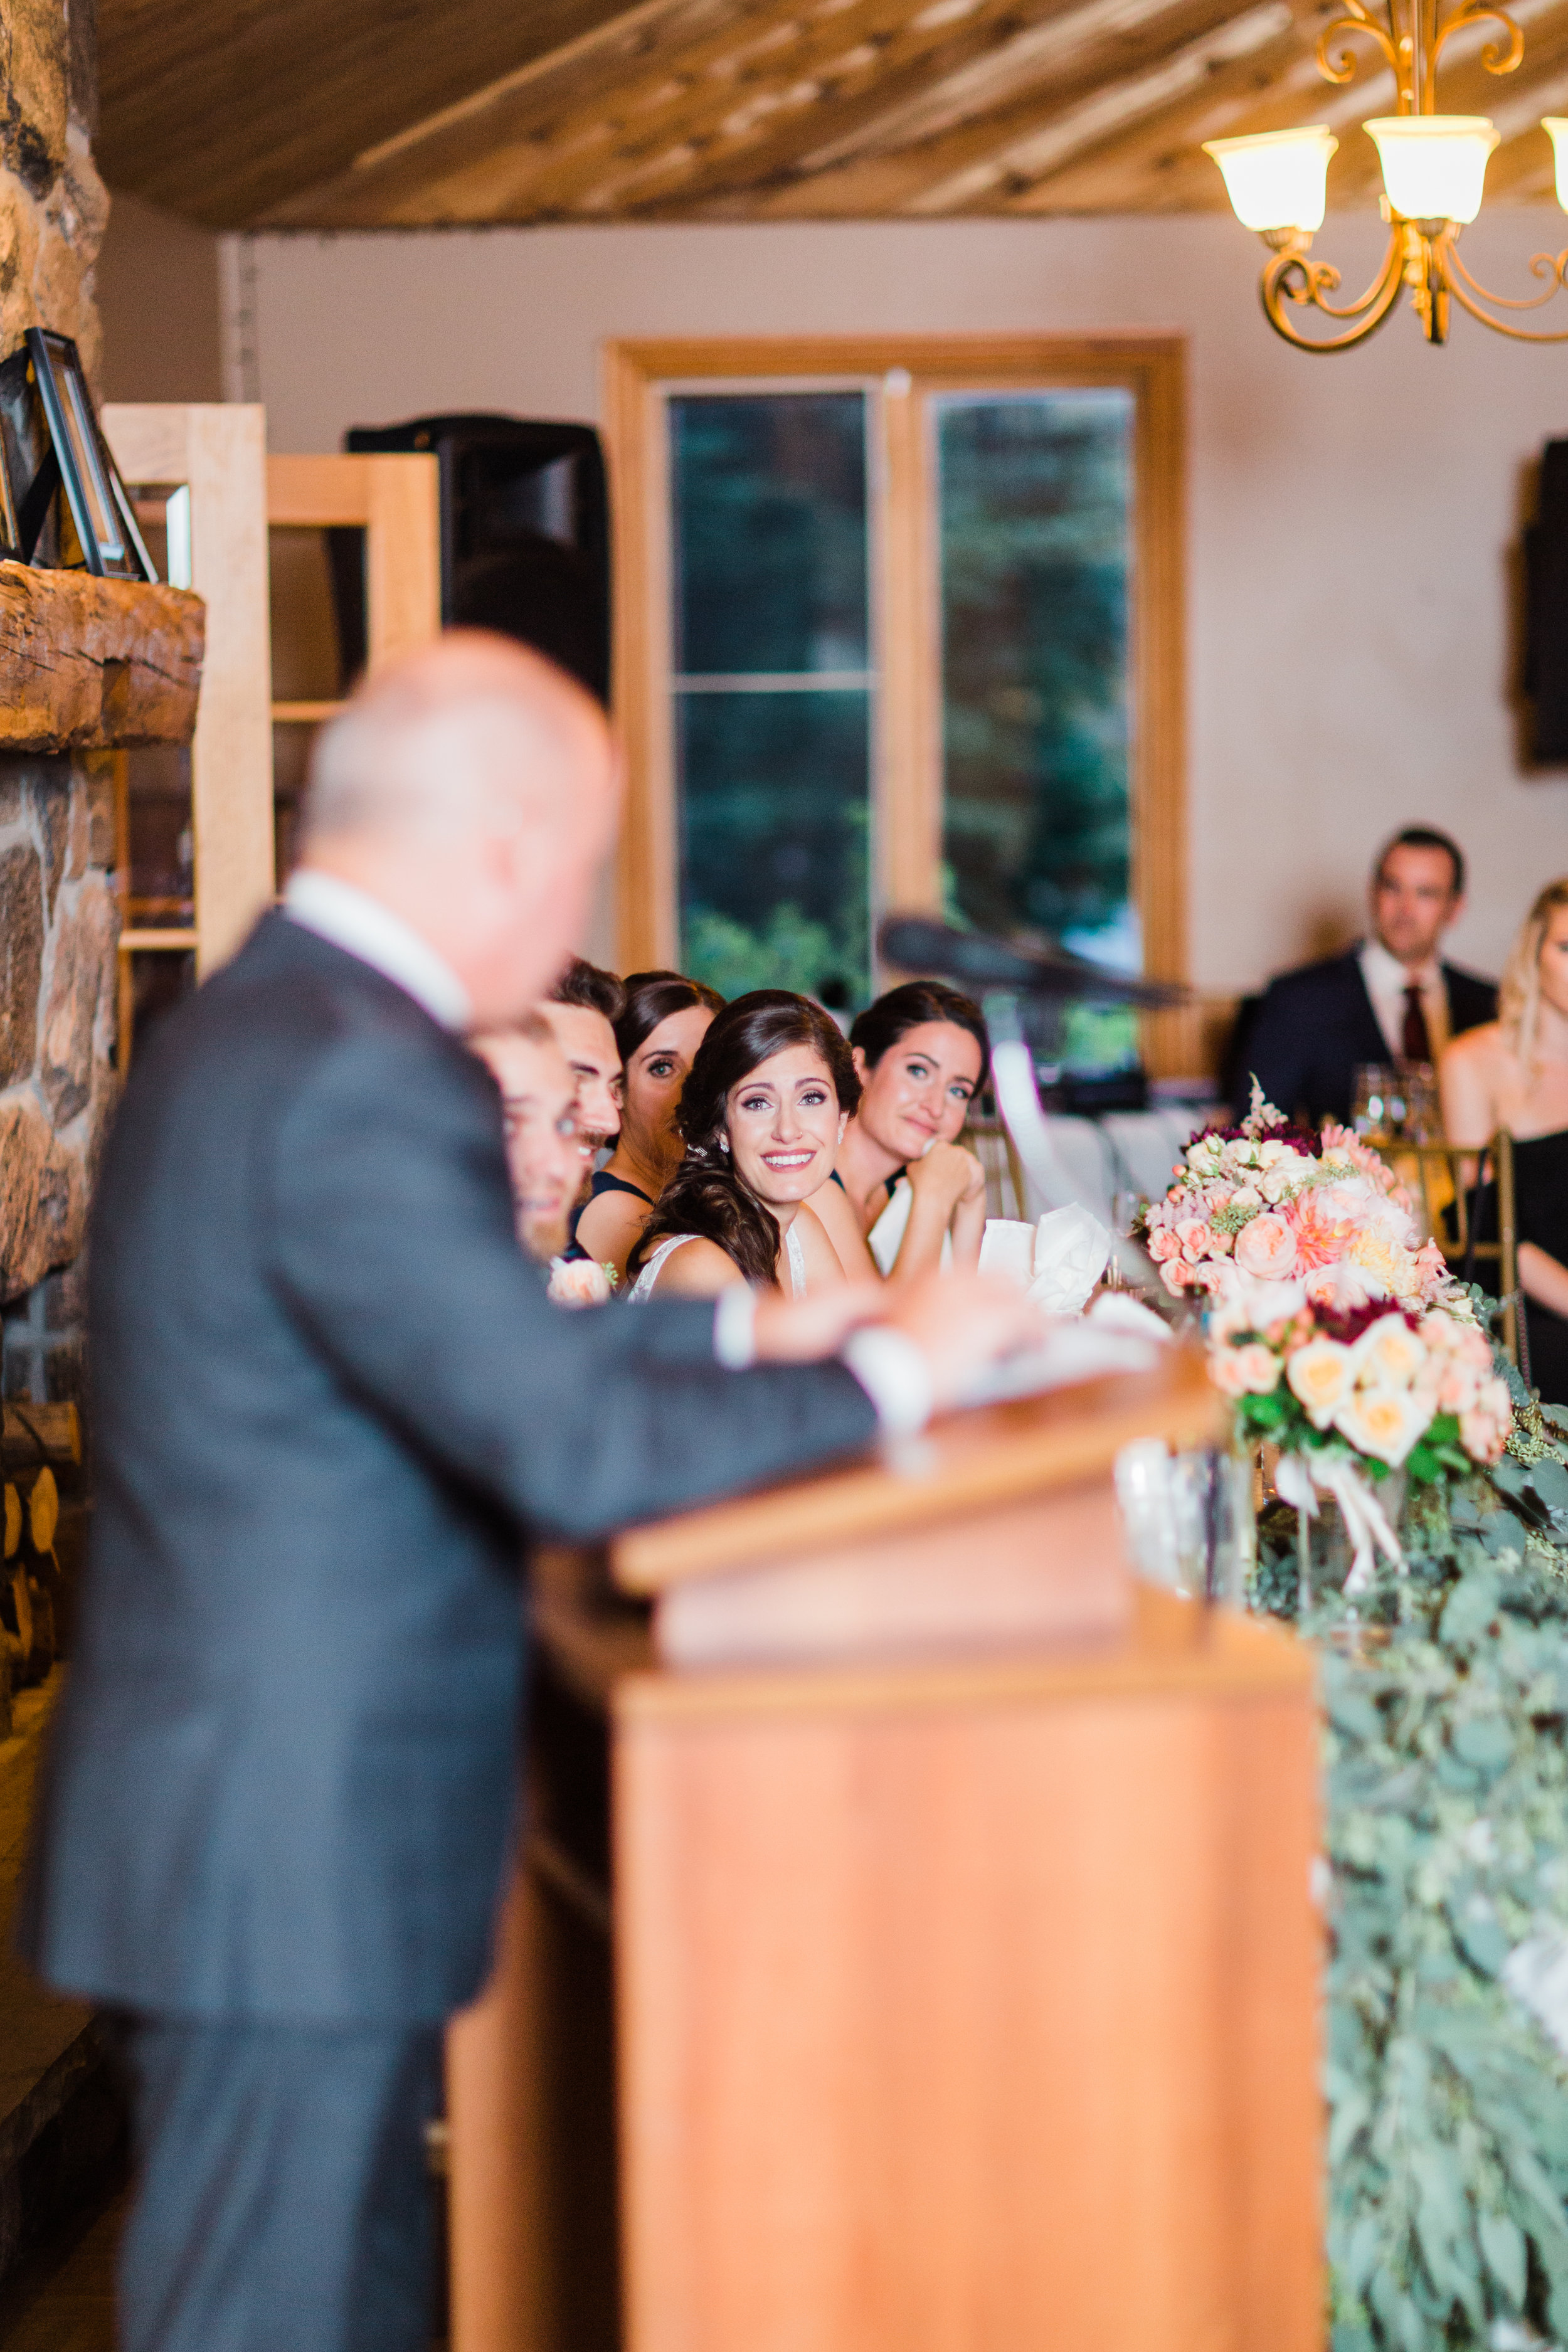 Amir-Golbazi-Danielle-Giroux-Photography_Toronto-Wedding_Cedarwood_Rachel-Paul_642.jpg